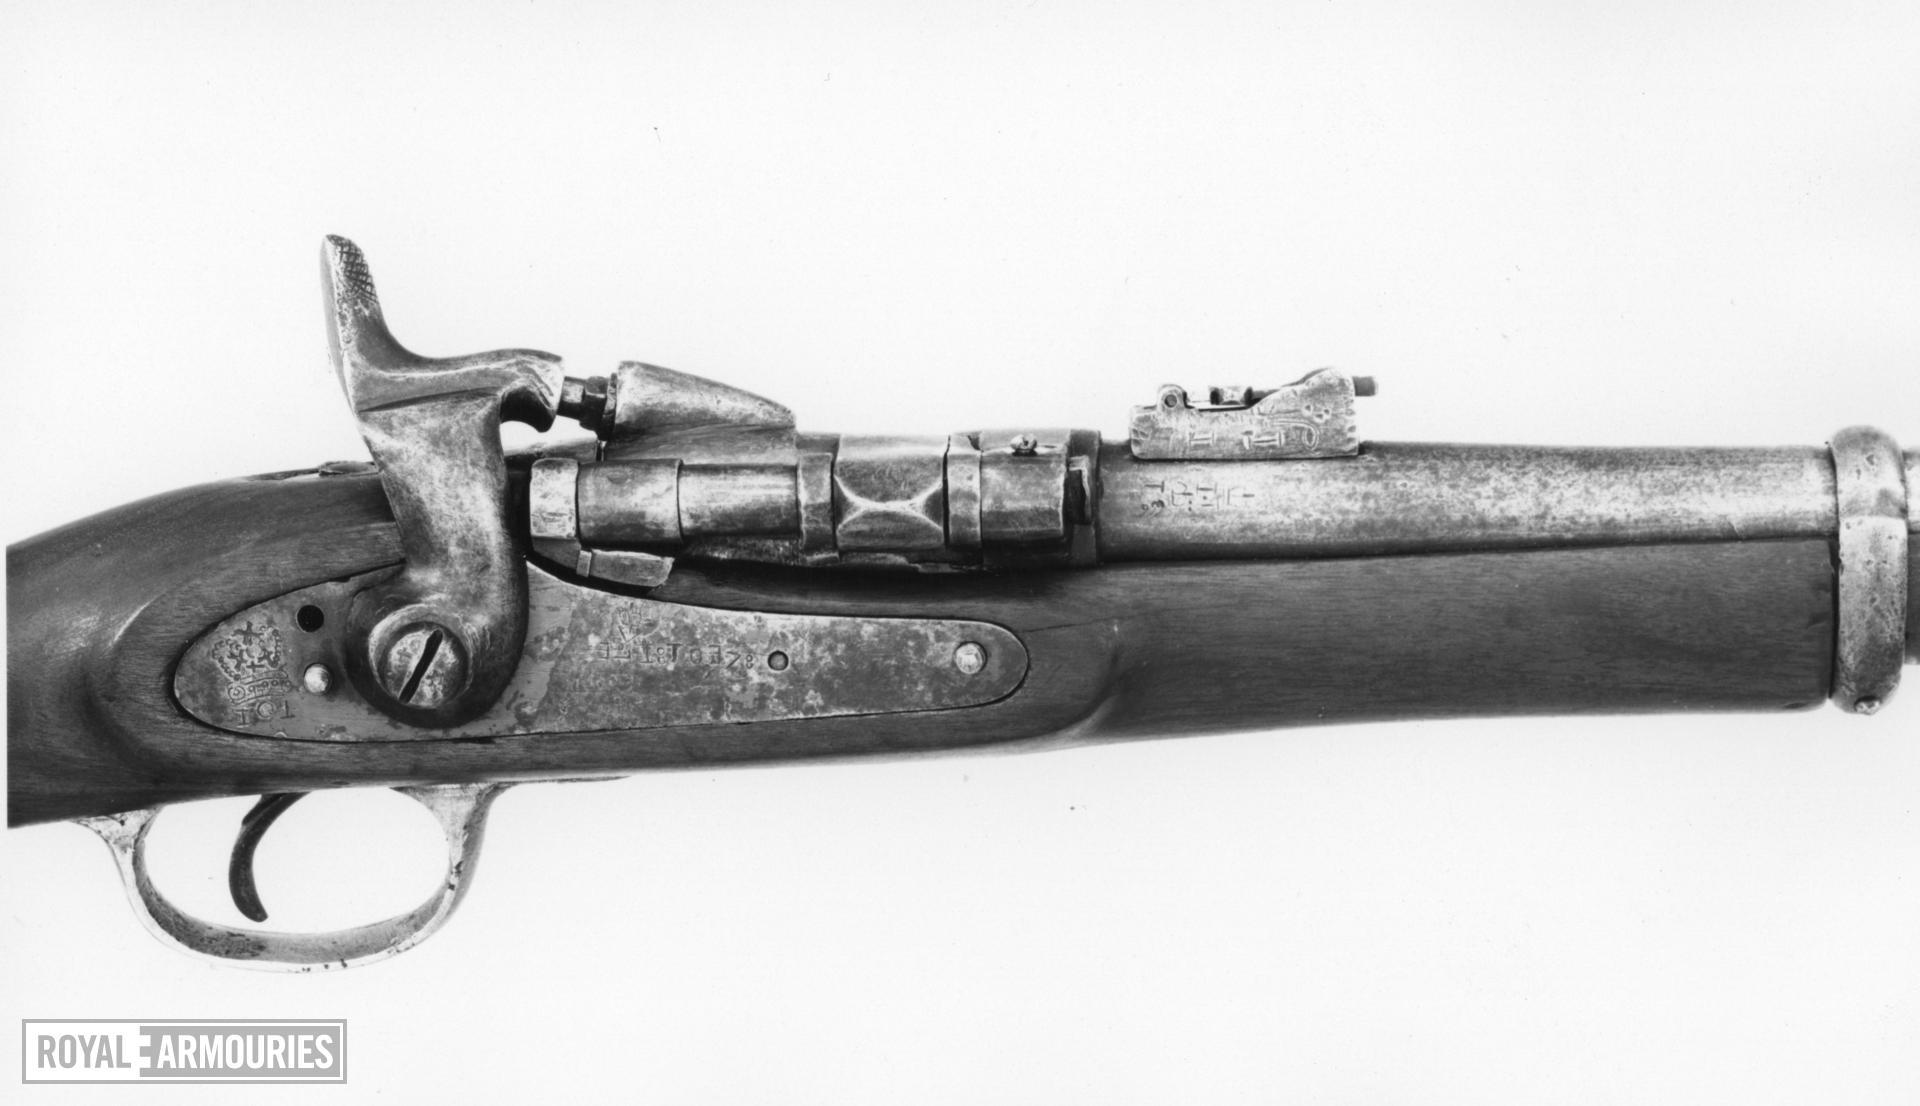 Centrefire carbine Snider